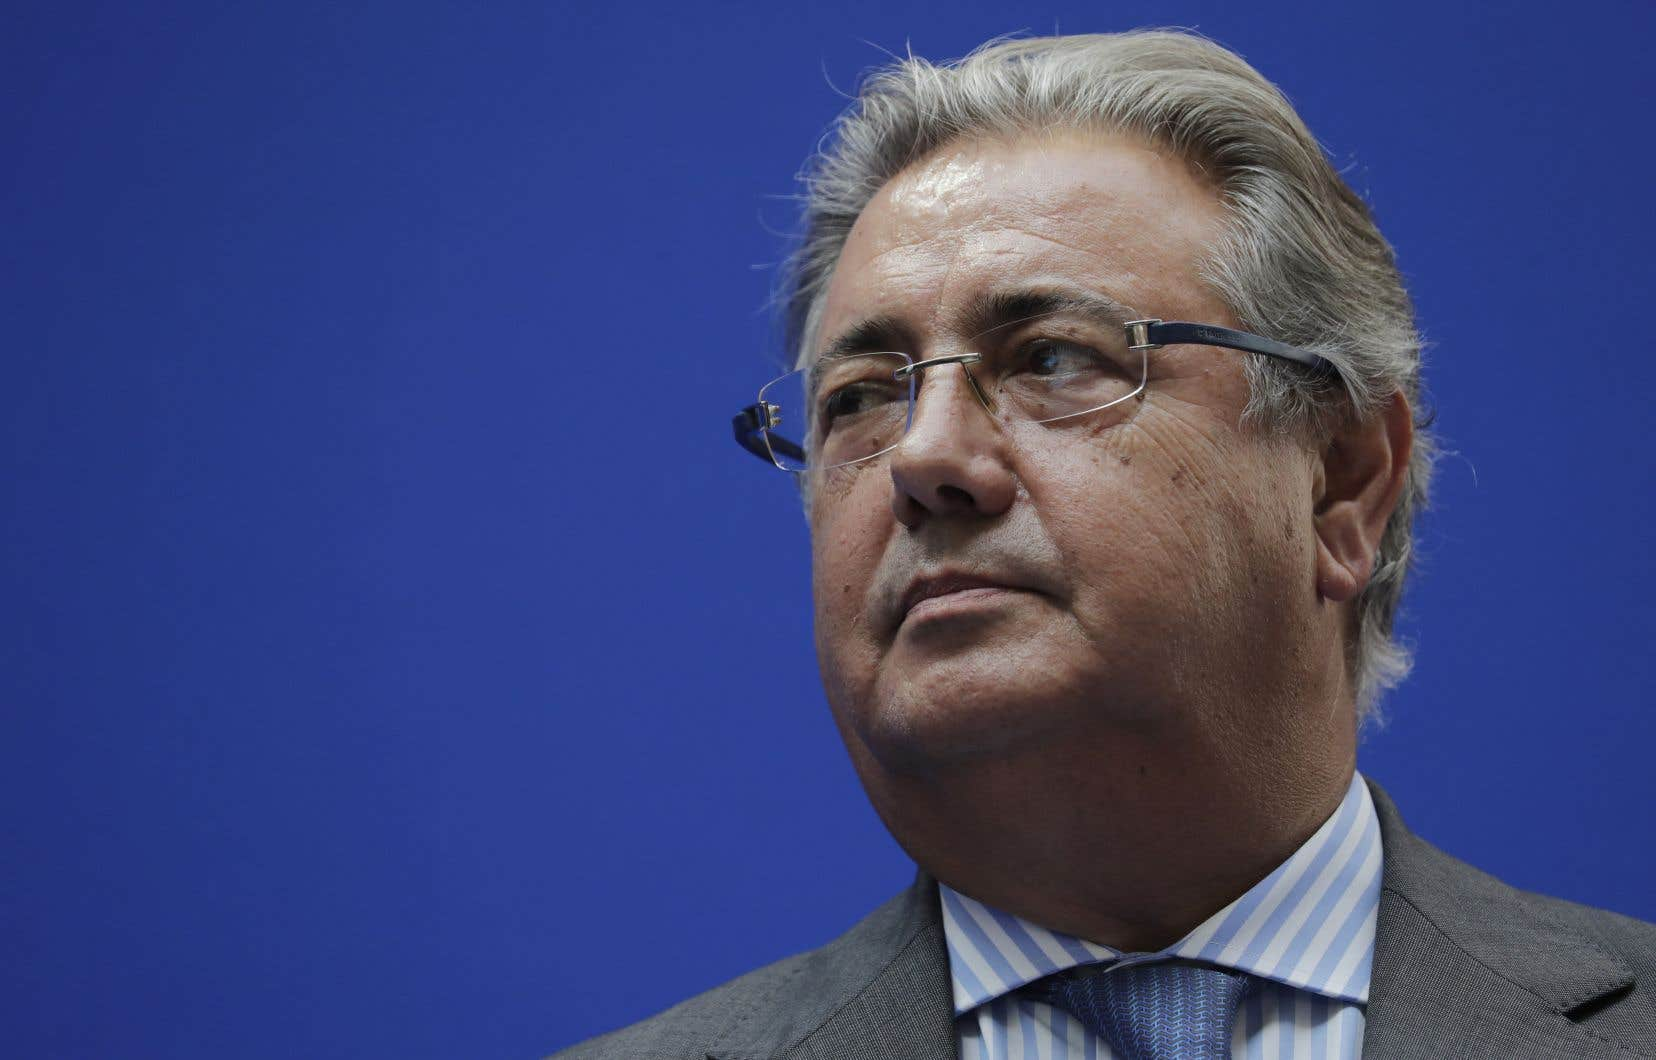 Le ministre espagnol de l'Intérieur, Juan Ignacio Zoido